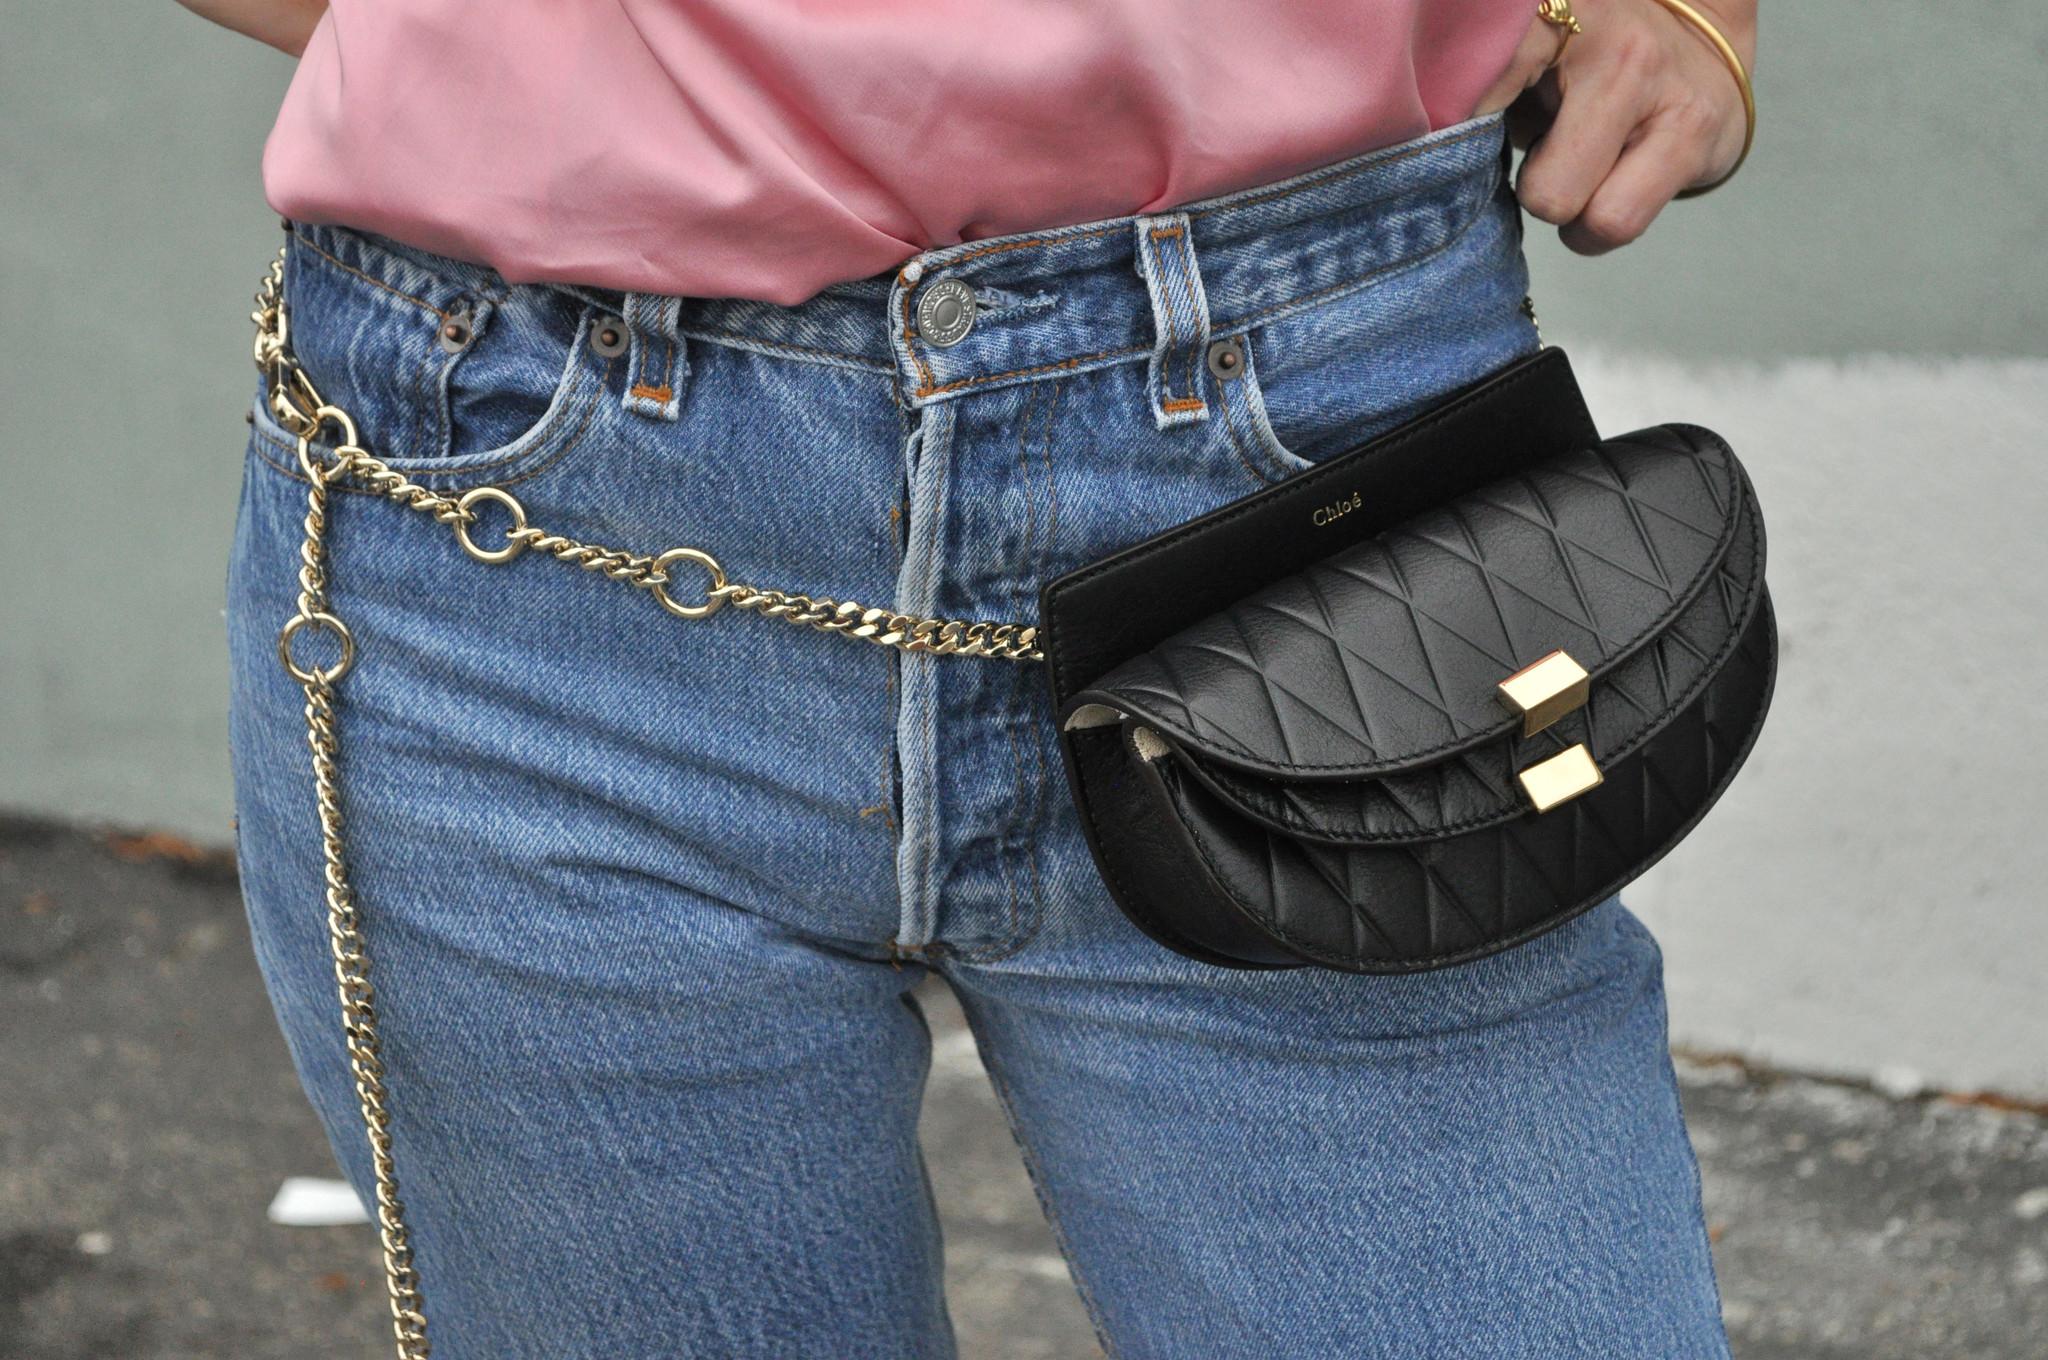 Chlo¨¦ Georgia Leather Bum Bag in Black | Lyst